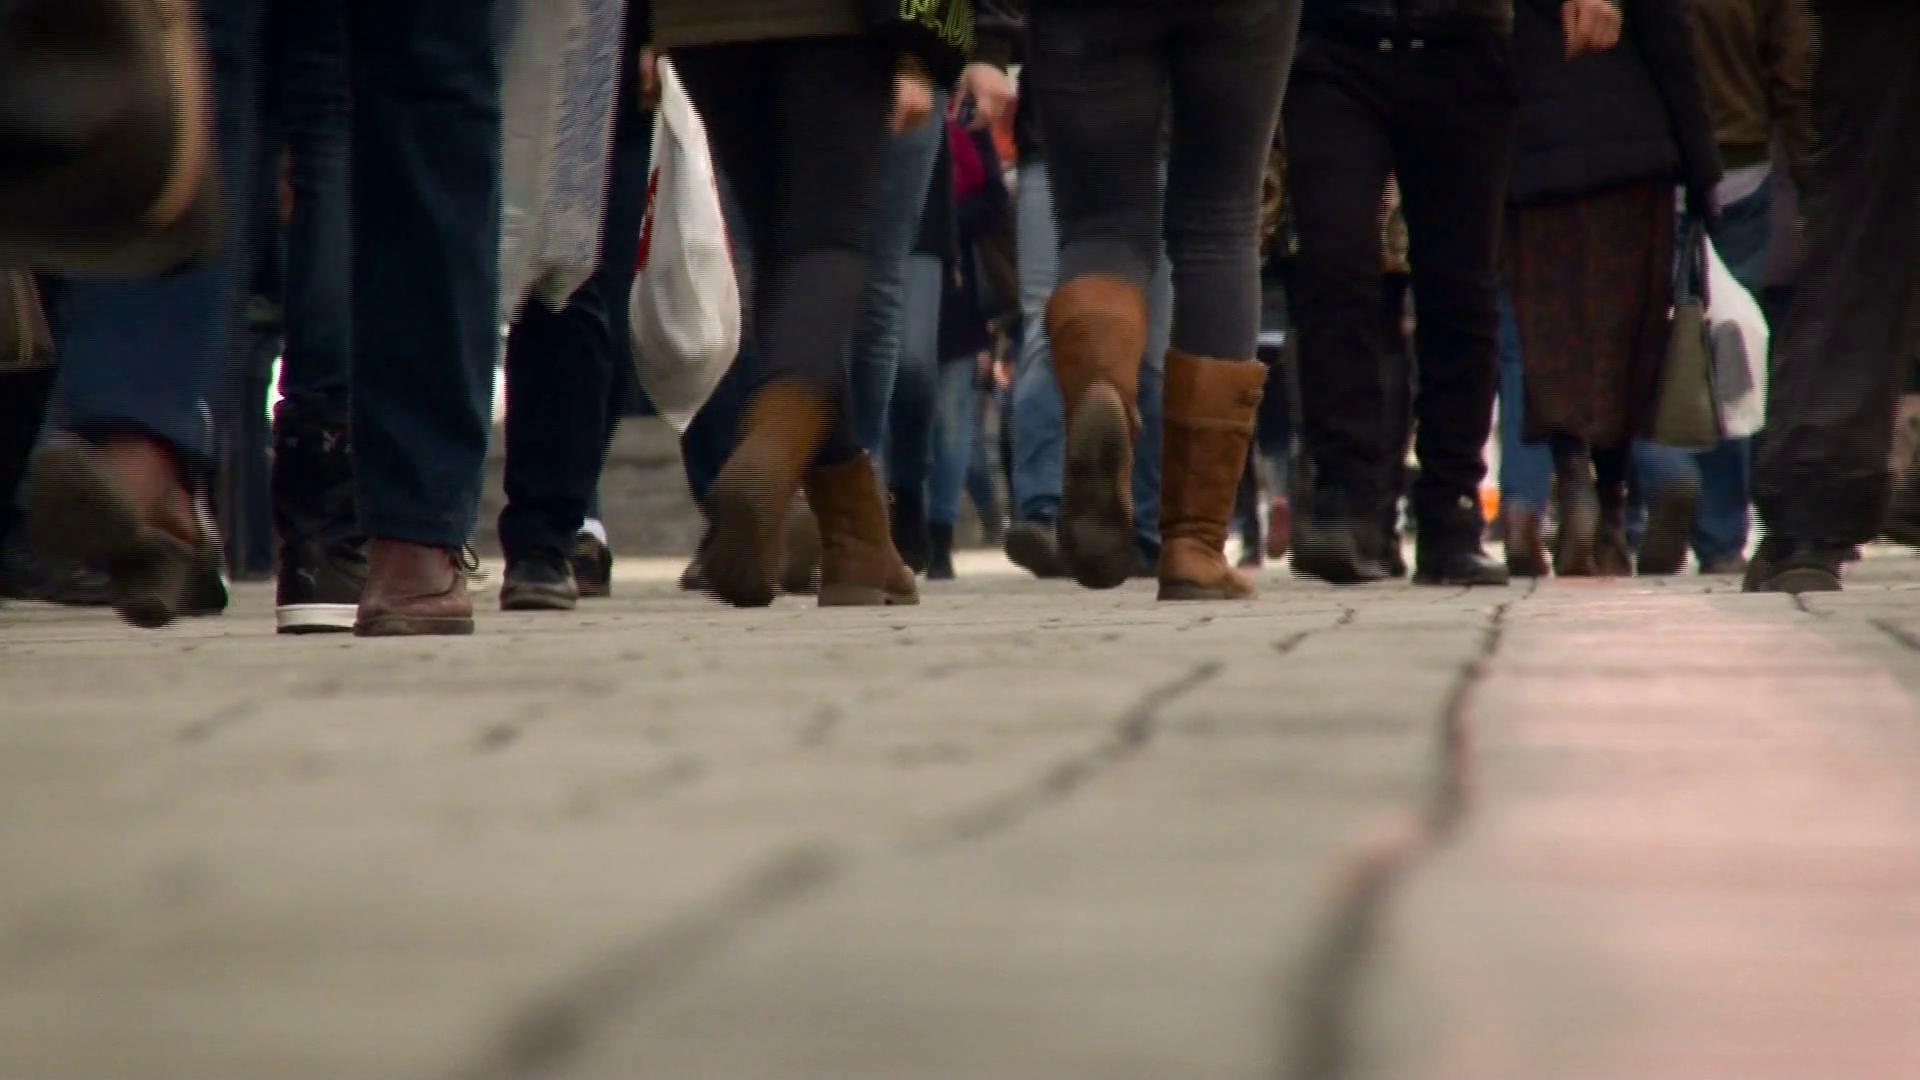 City People Walking on the Sidewalk. Individuals Wearing Jeans ...